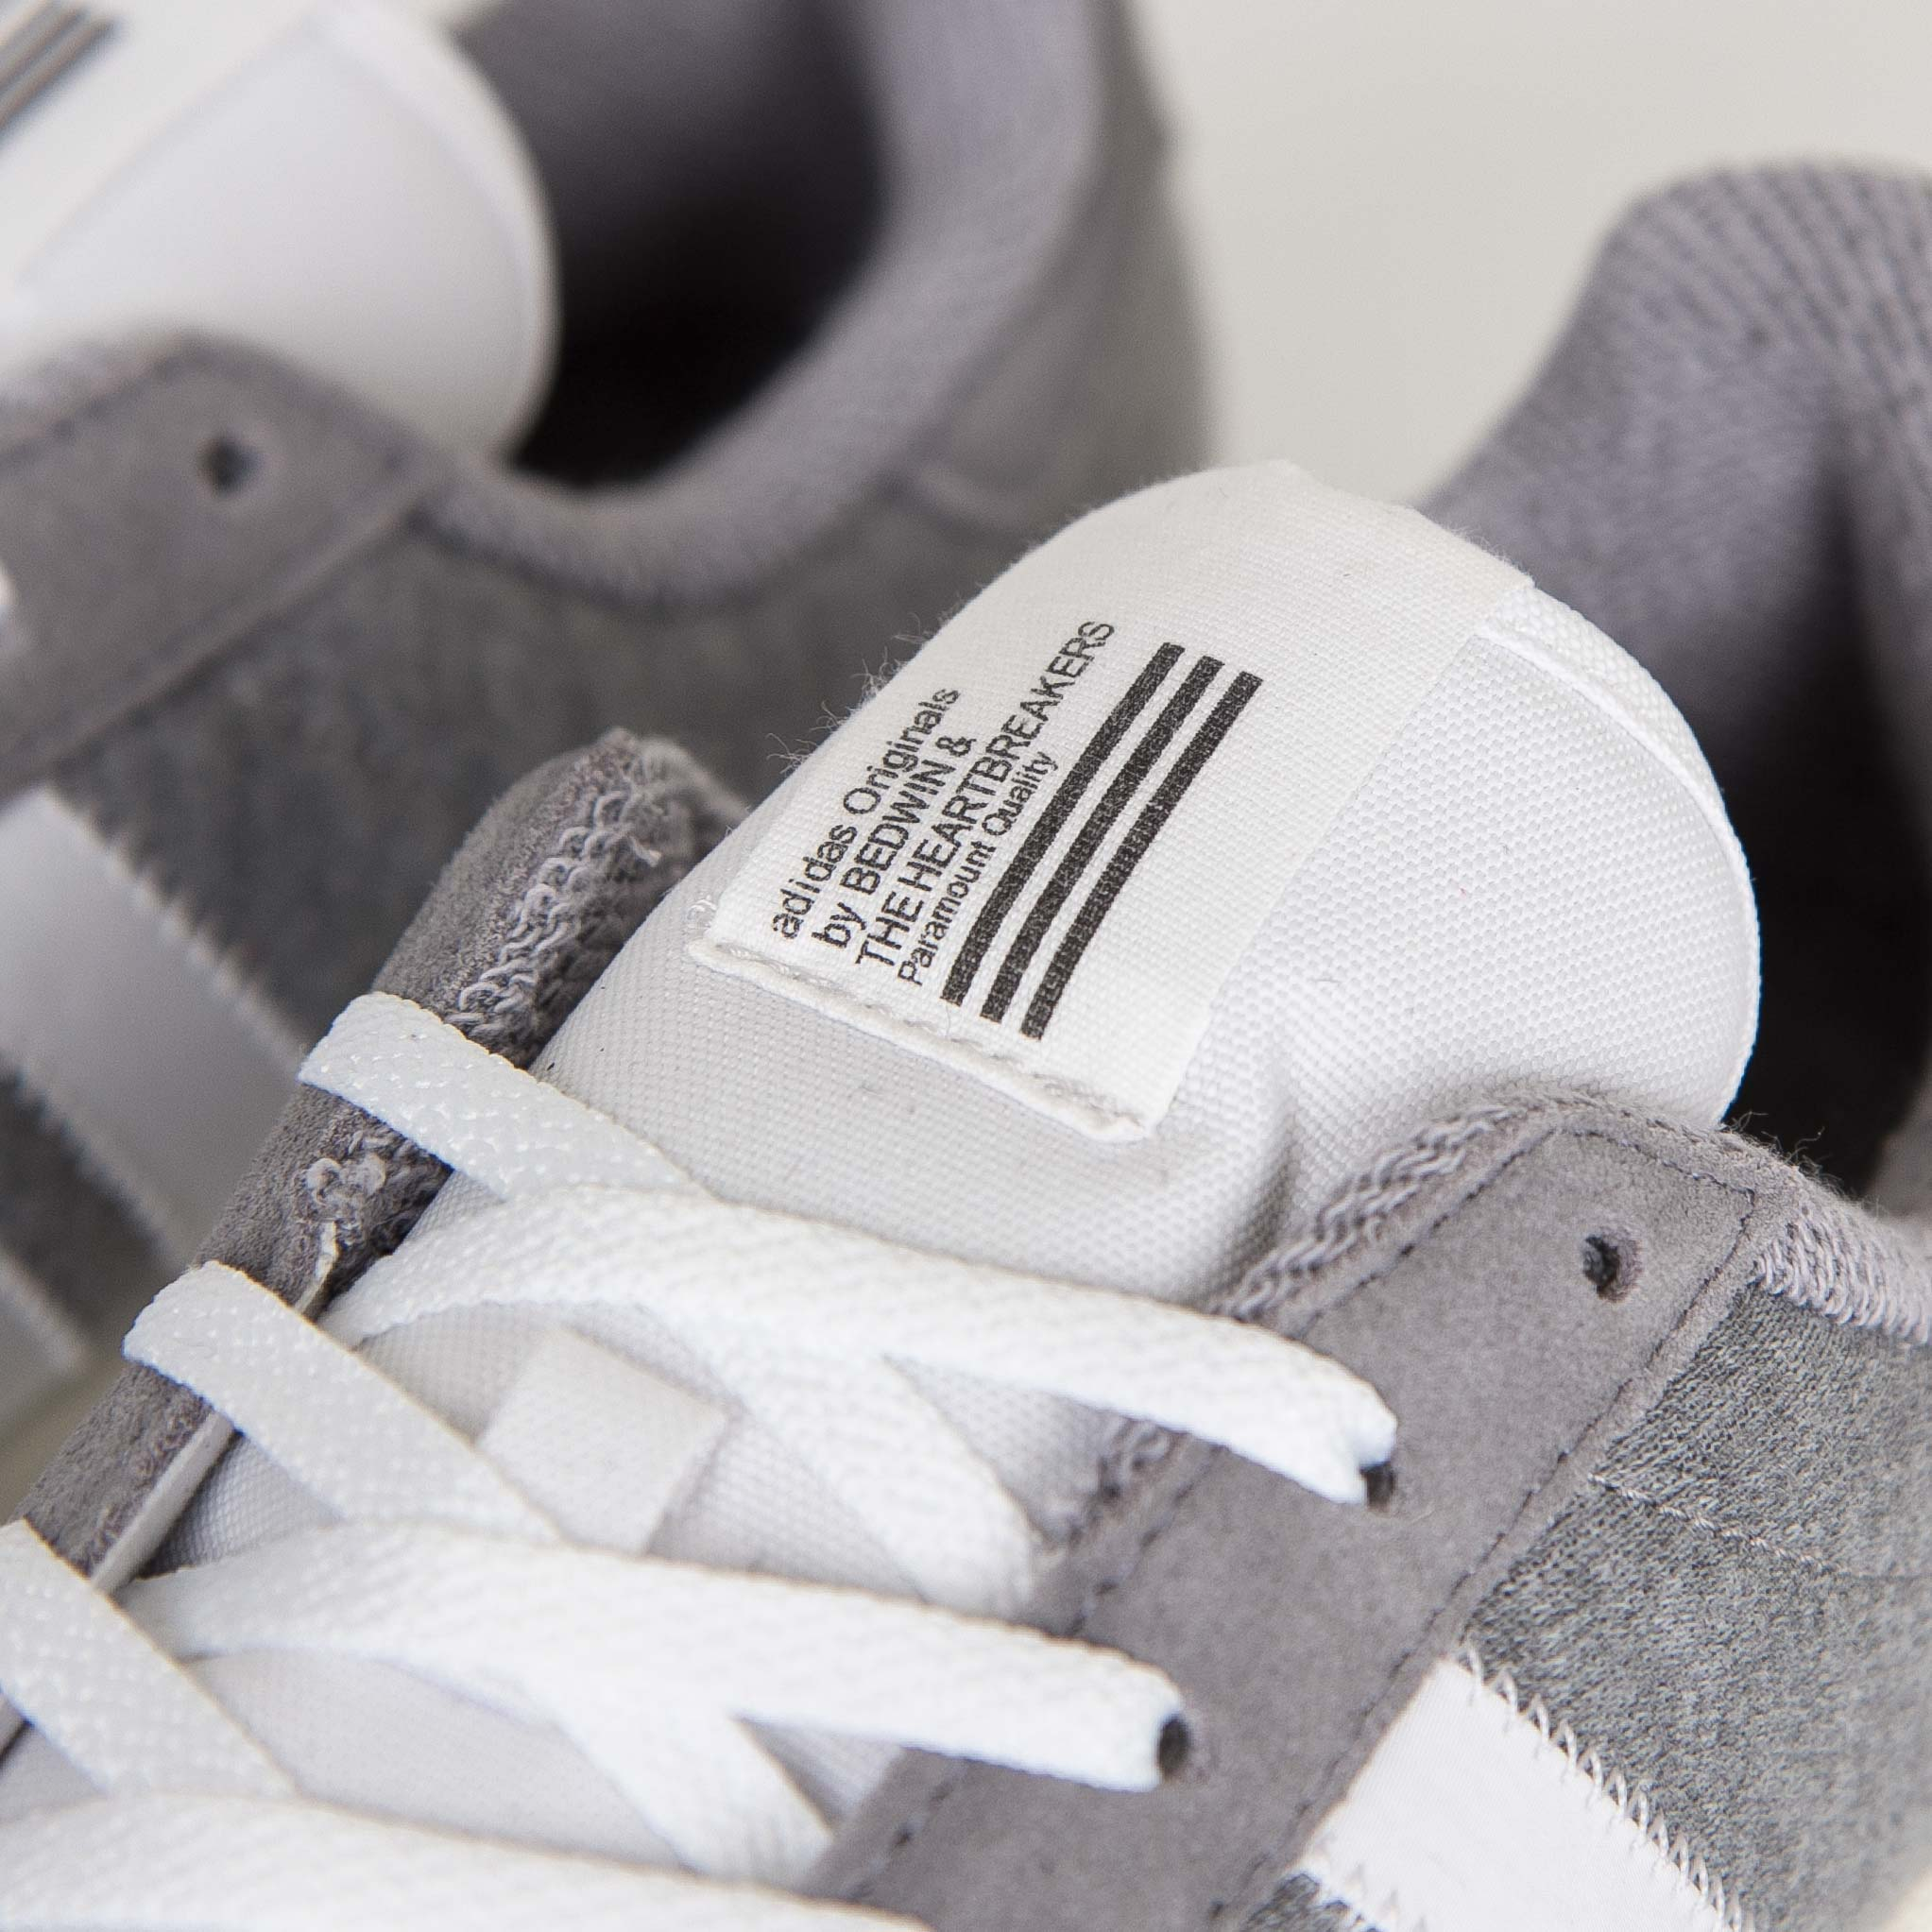 new arrival 2b2ec 1b7f4 ... adidas BW Campus 80s ...